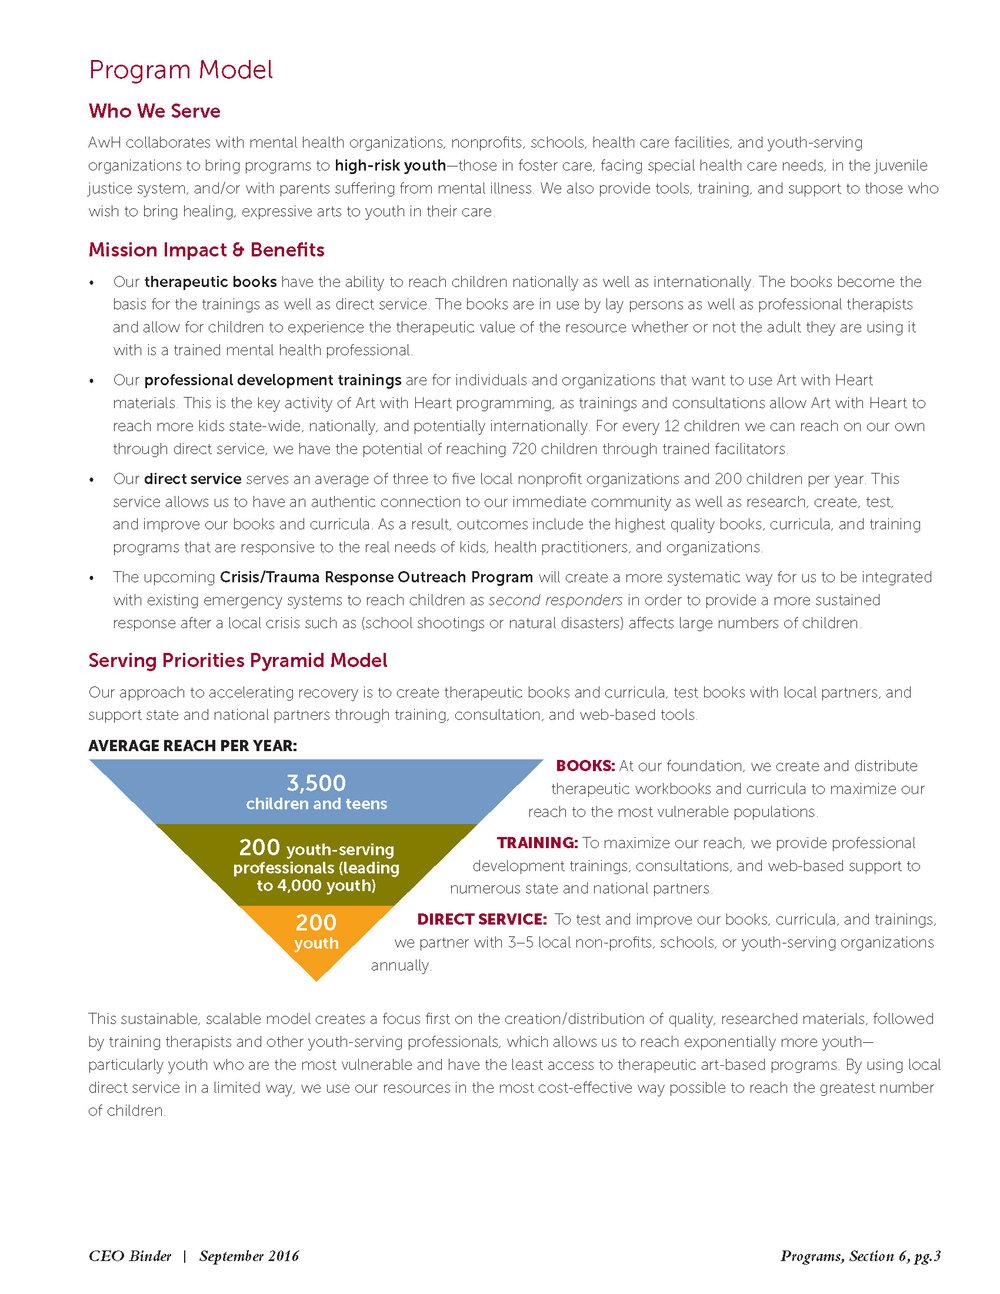 06.03 CEO Program Model.jpg